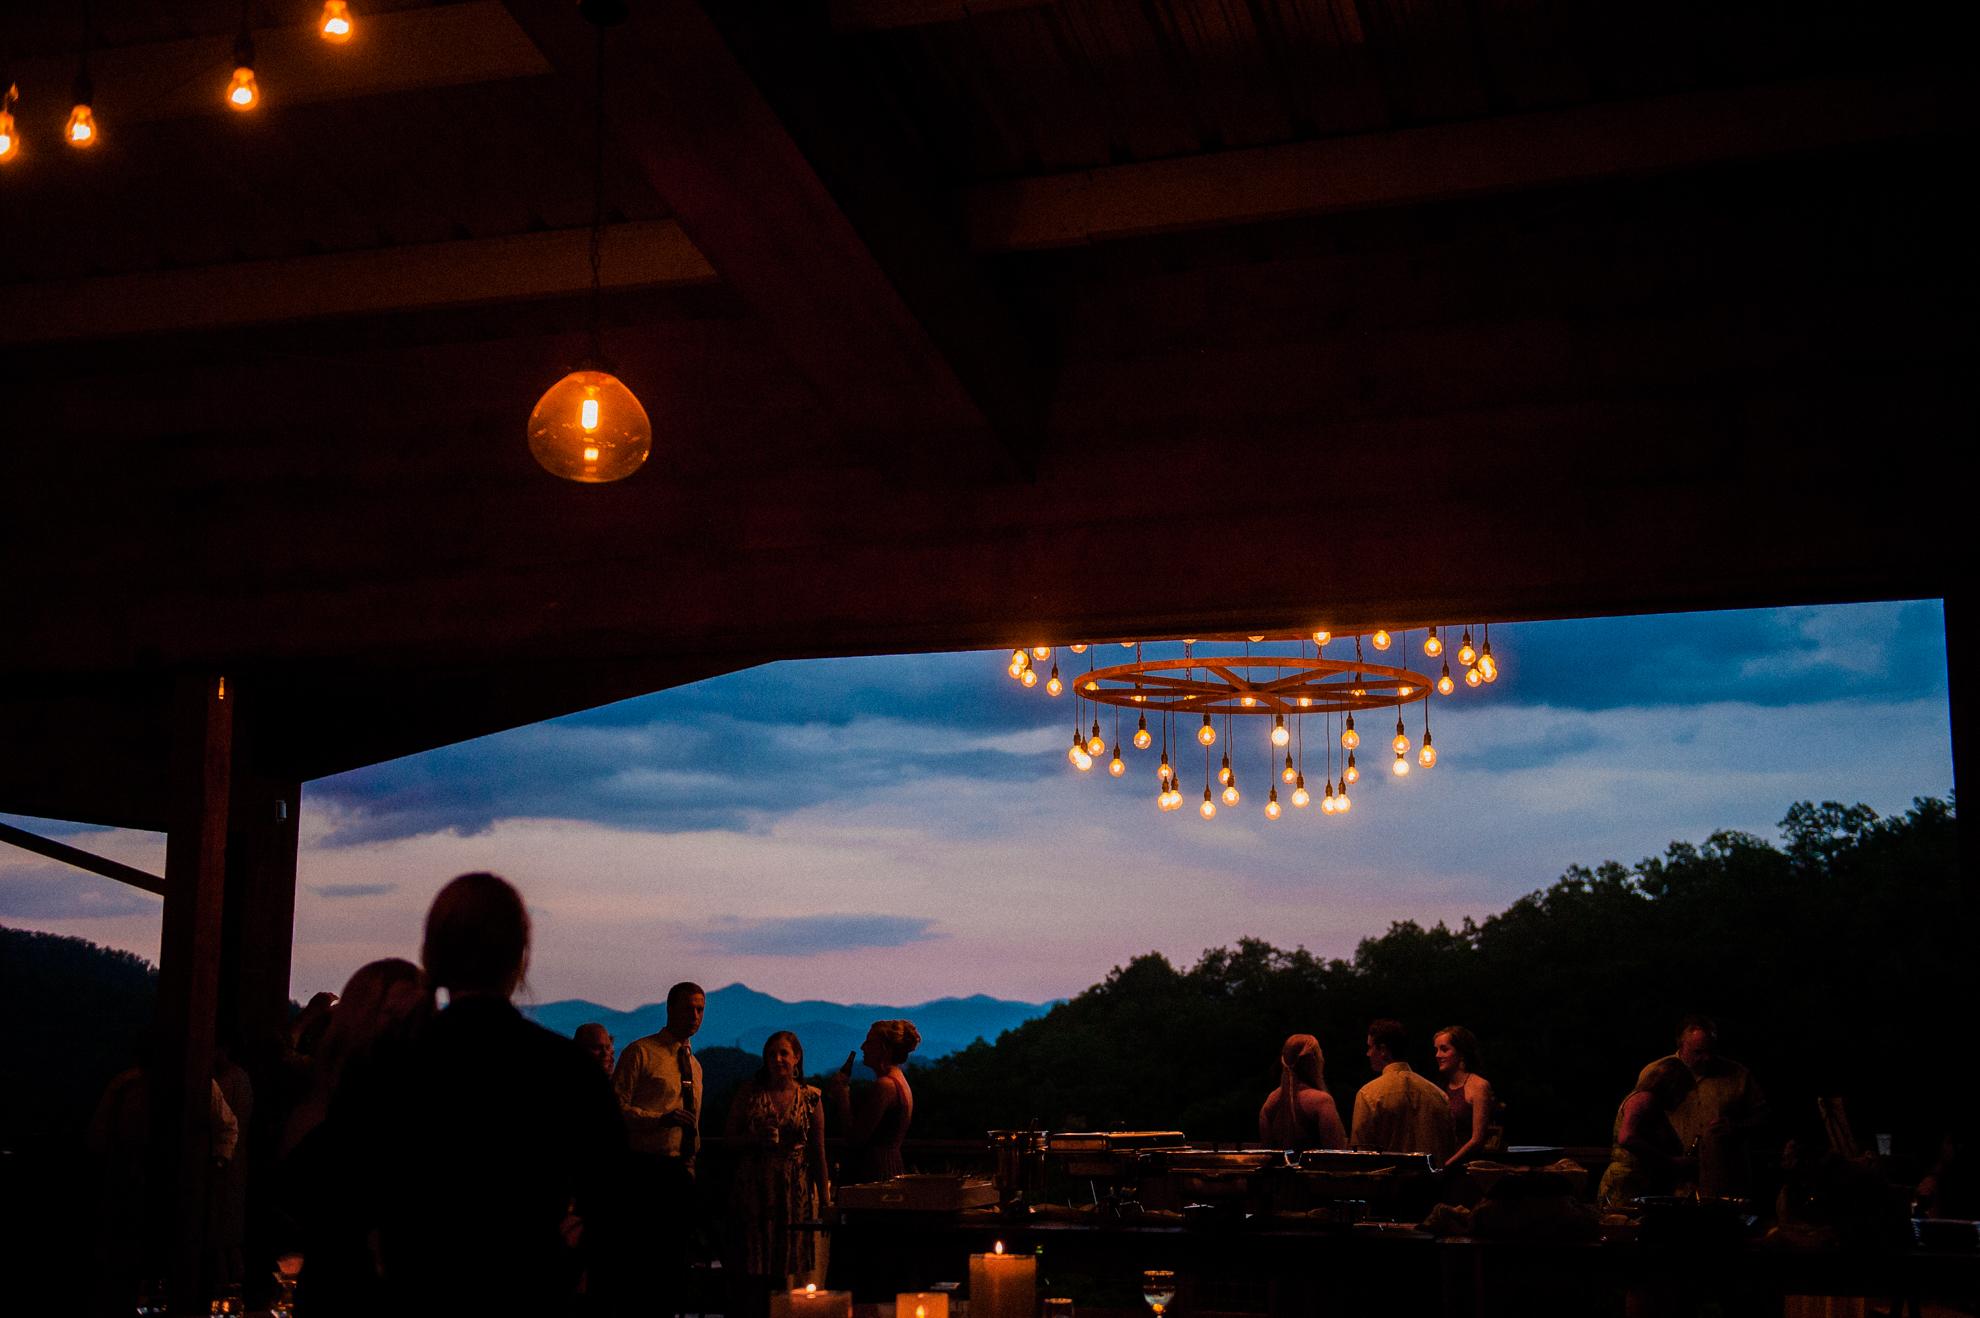 vineyards at bettys creek reception pavillion at sunset